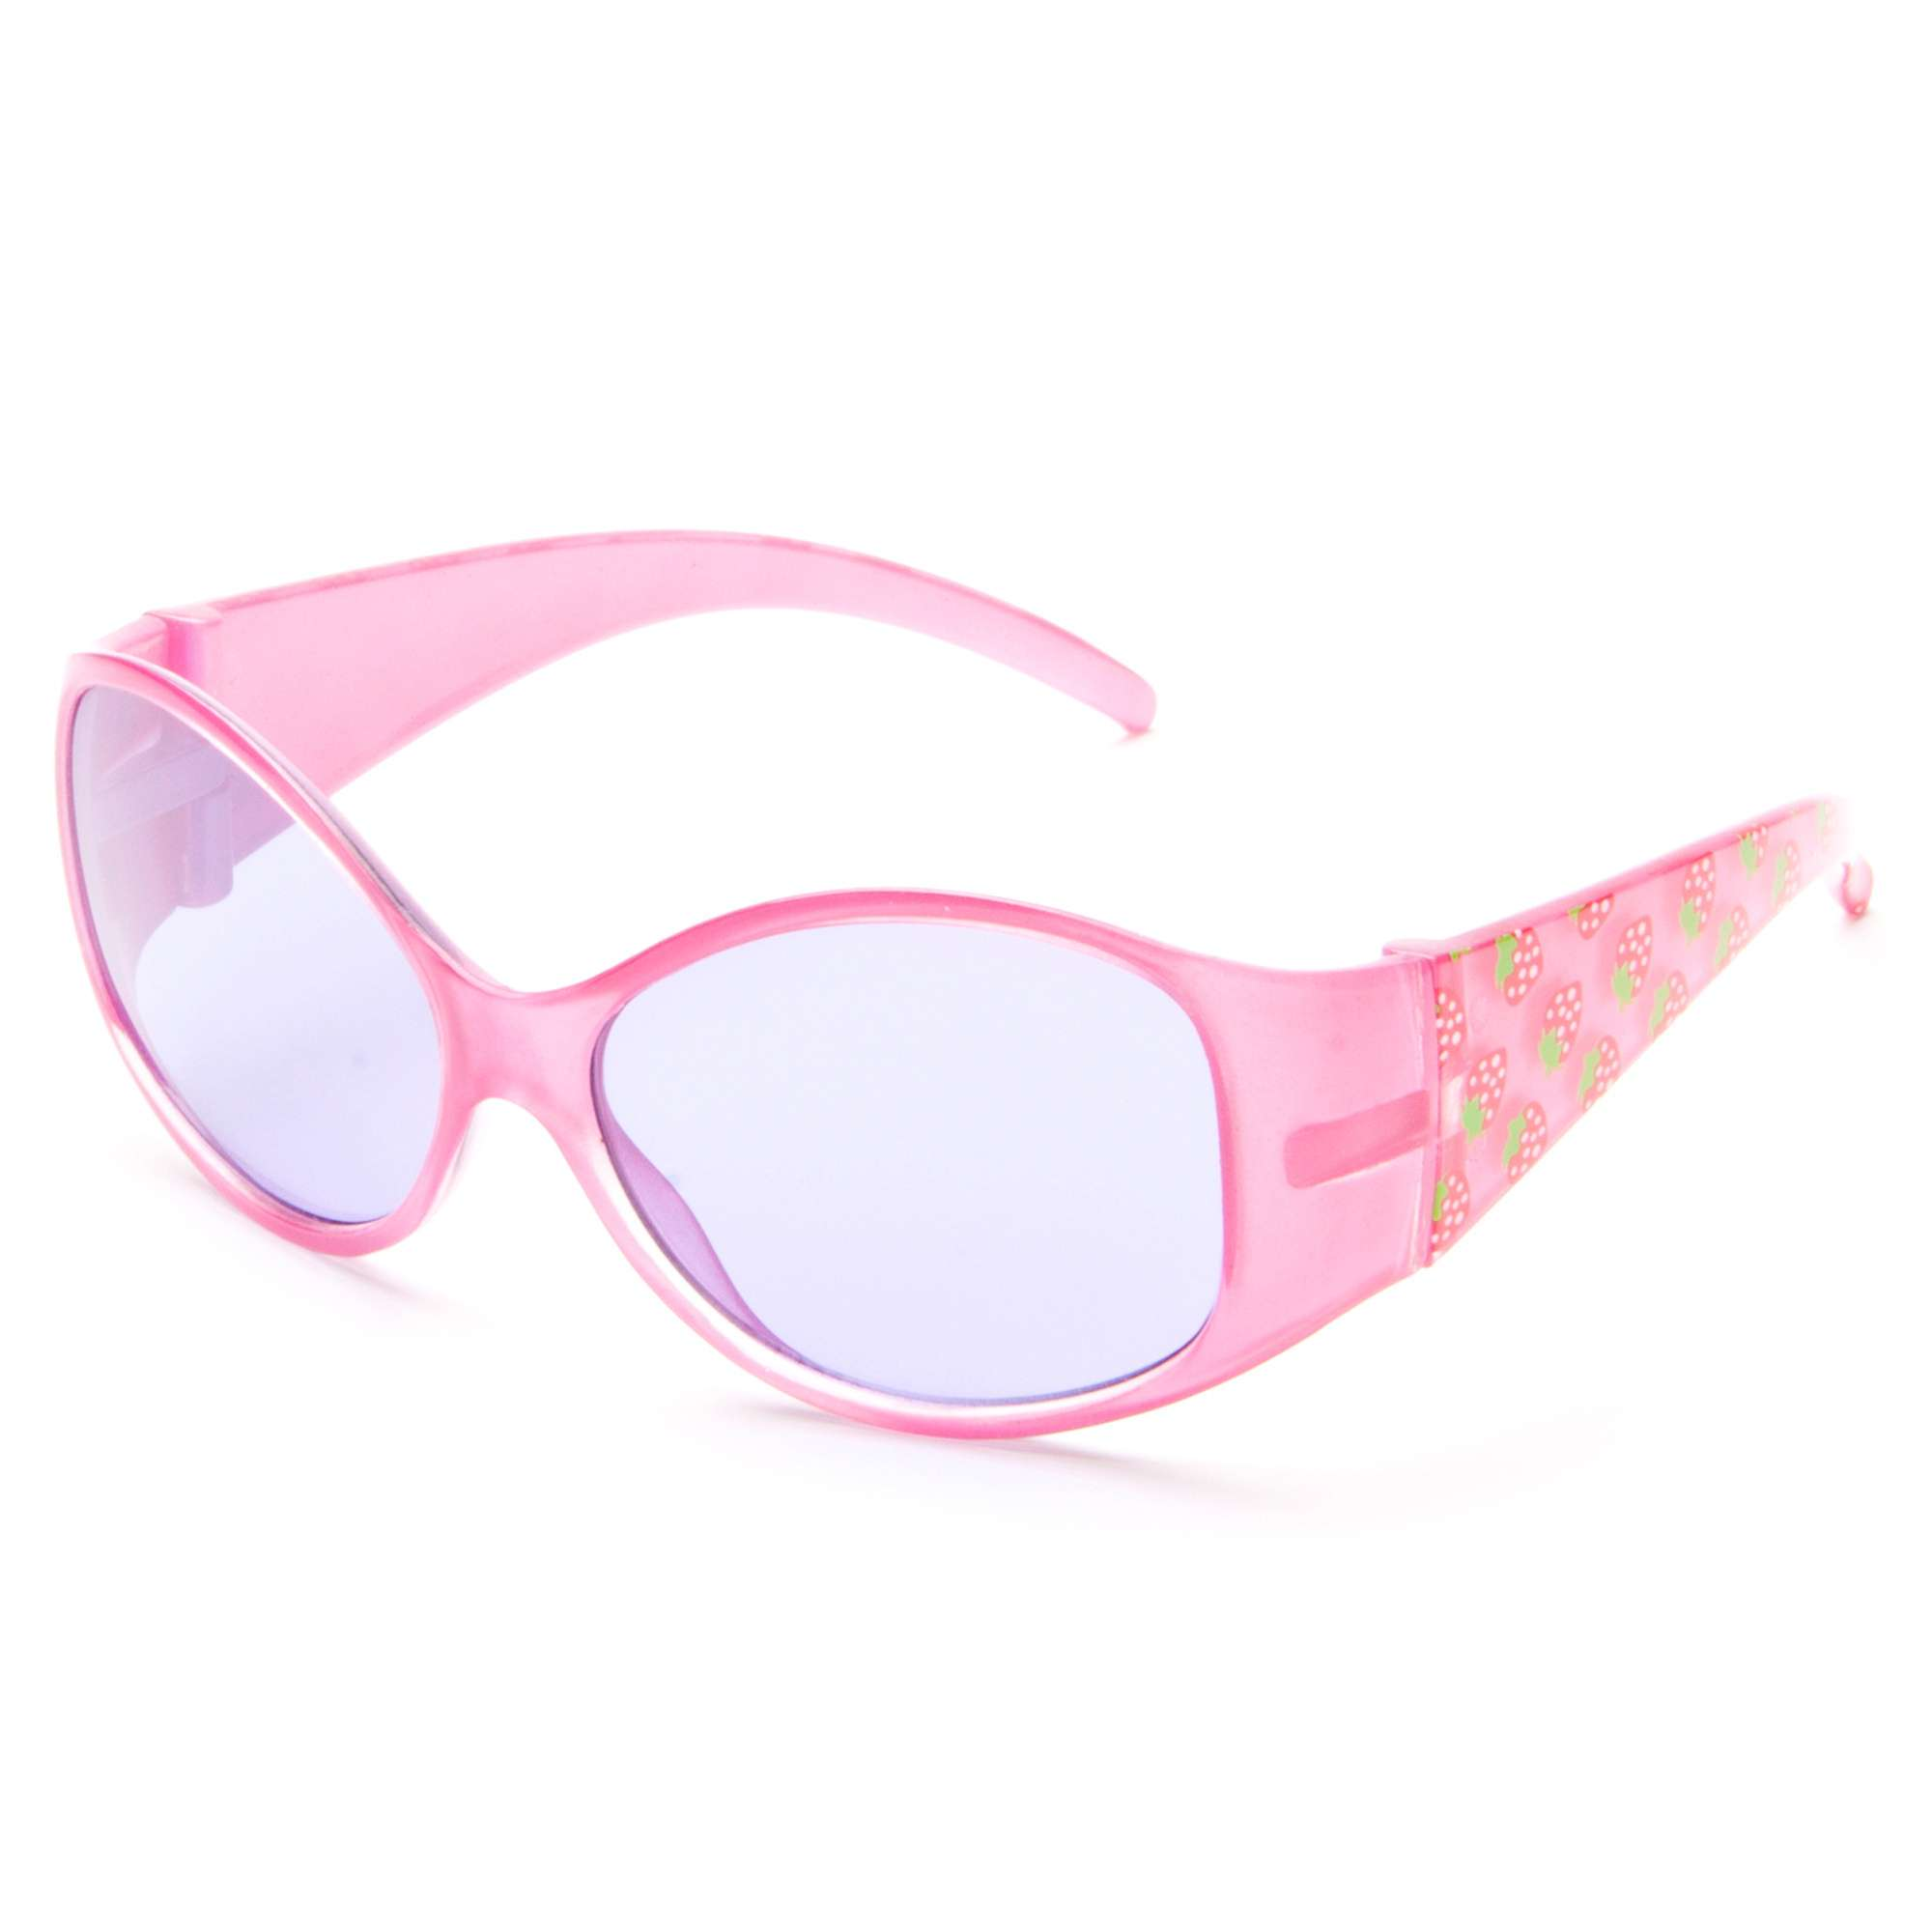 PETER STORM Girl's FF Sports Wrap-Around Sunglasses